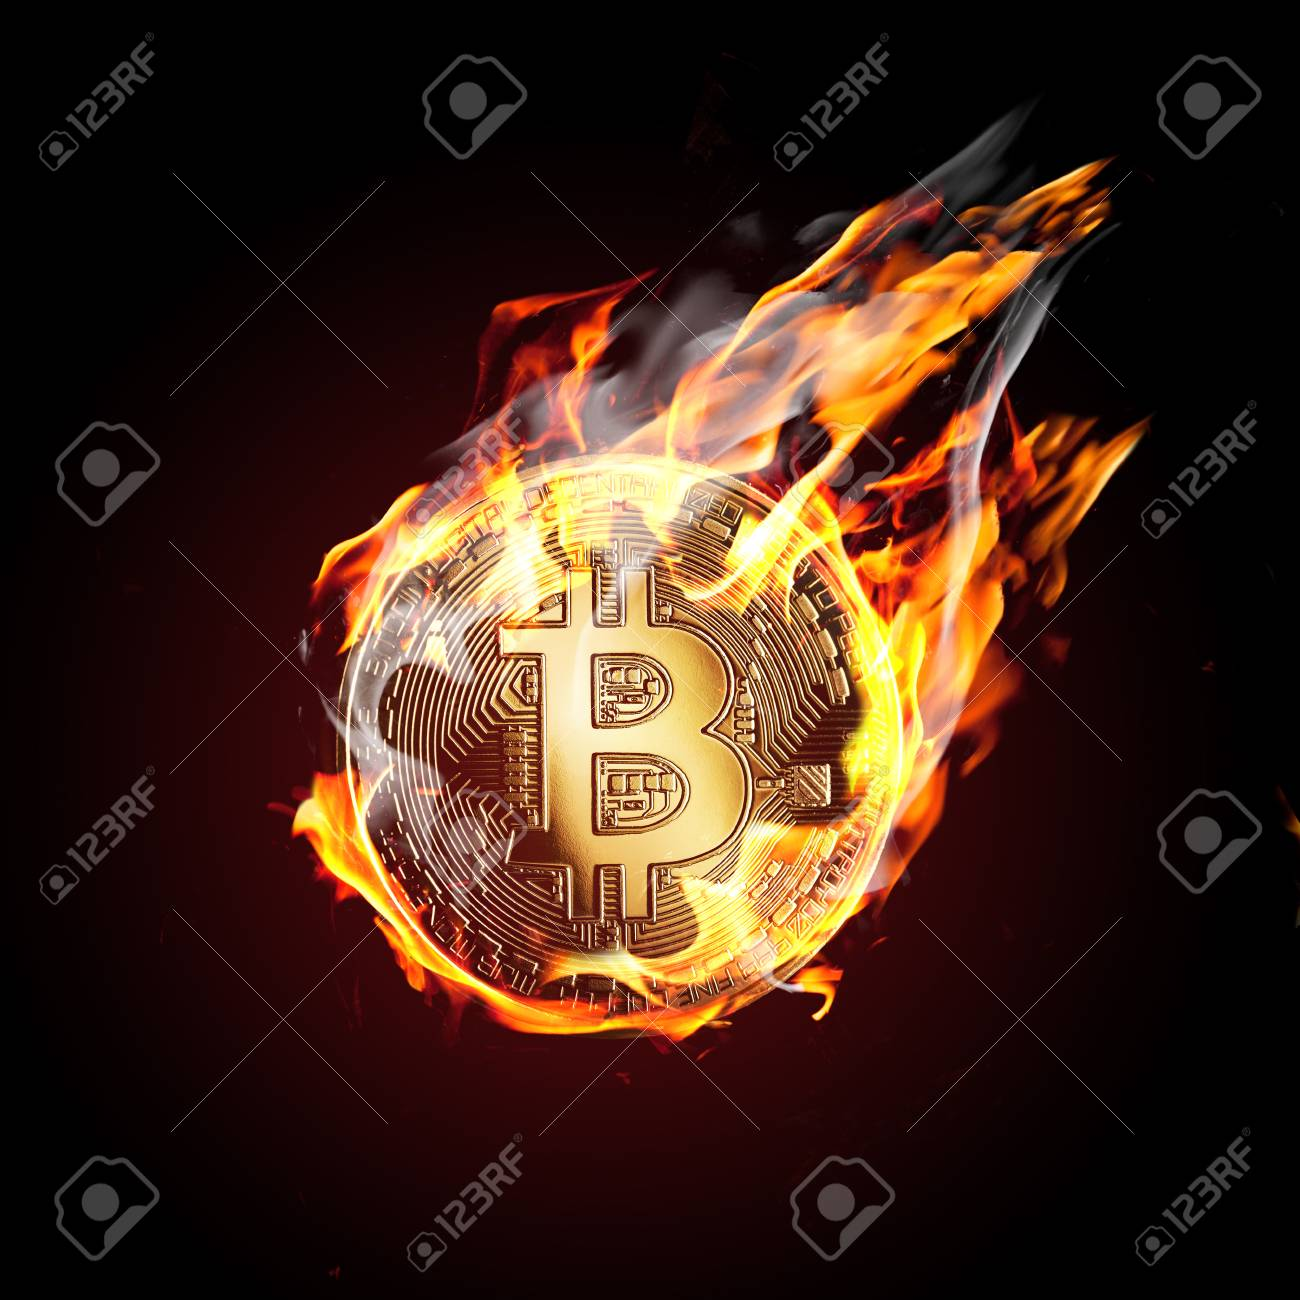 btc flame bitcoin stock td ameritrade